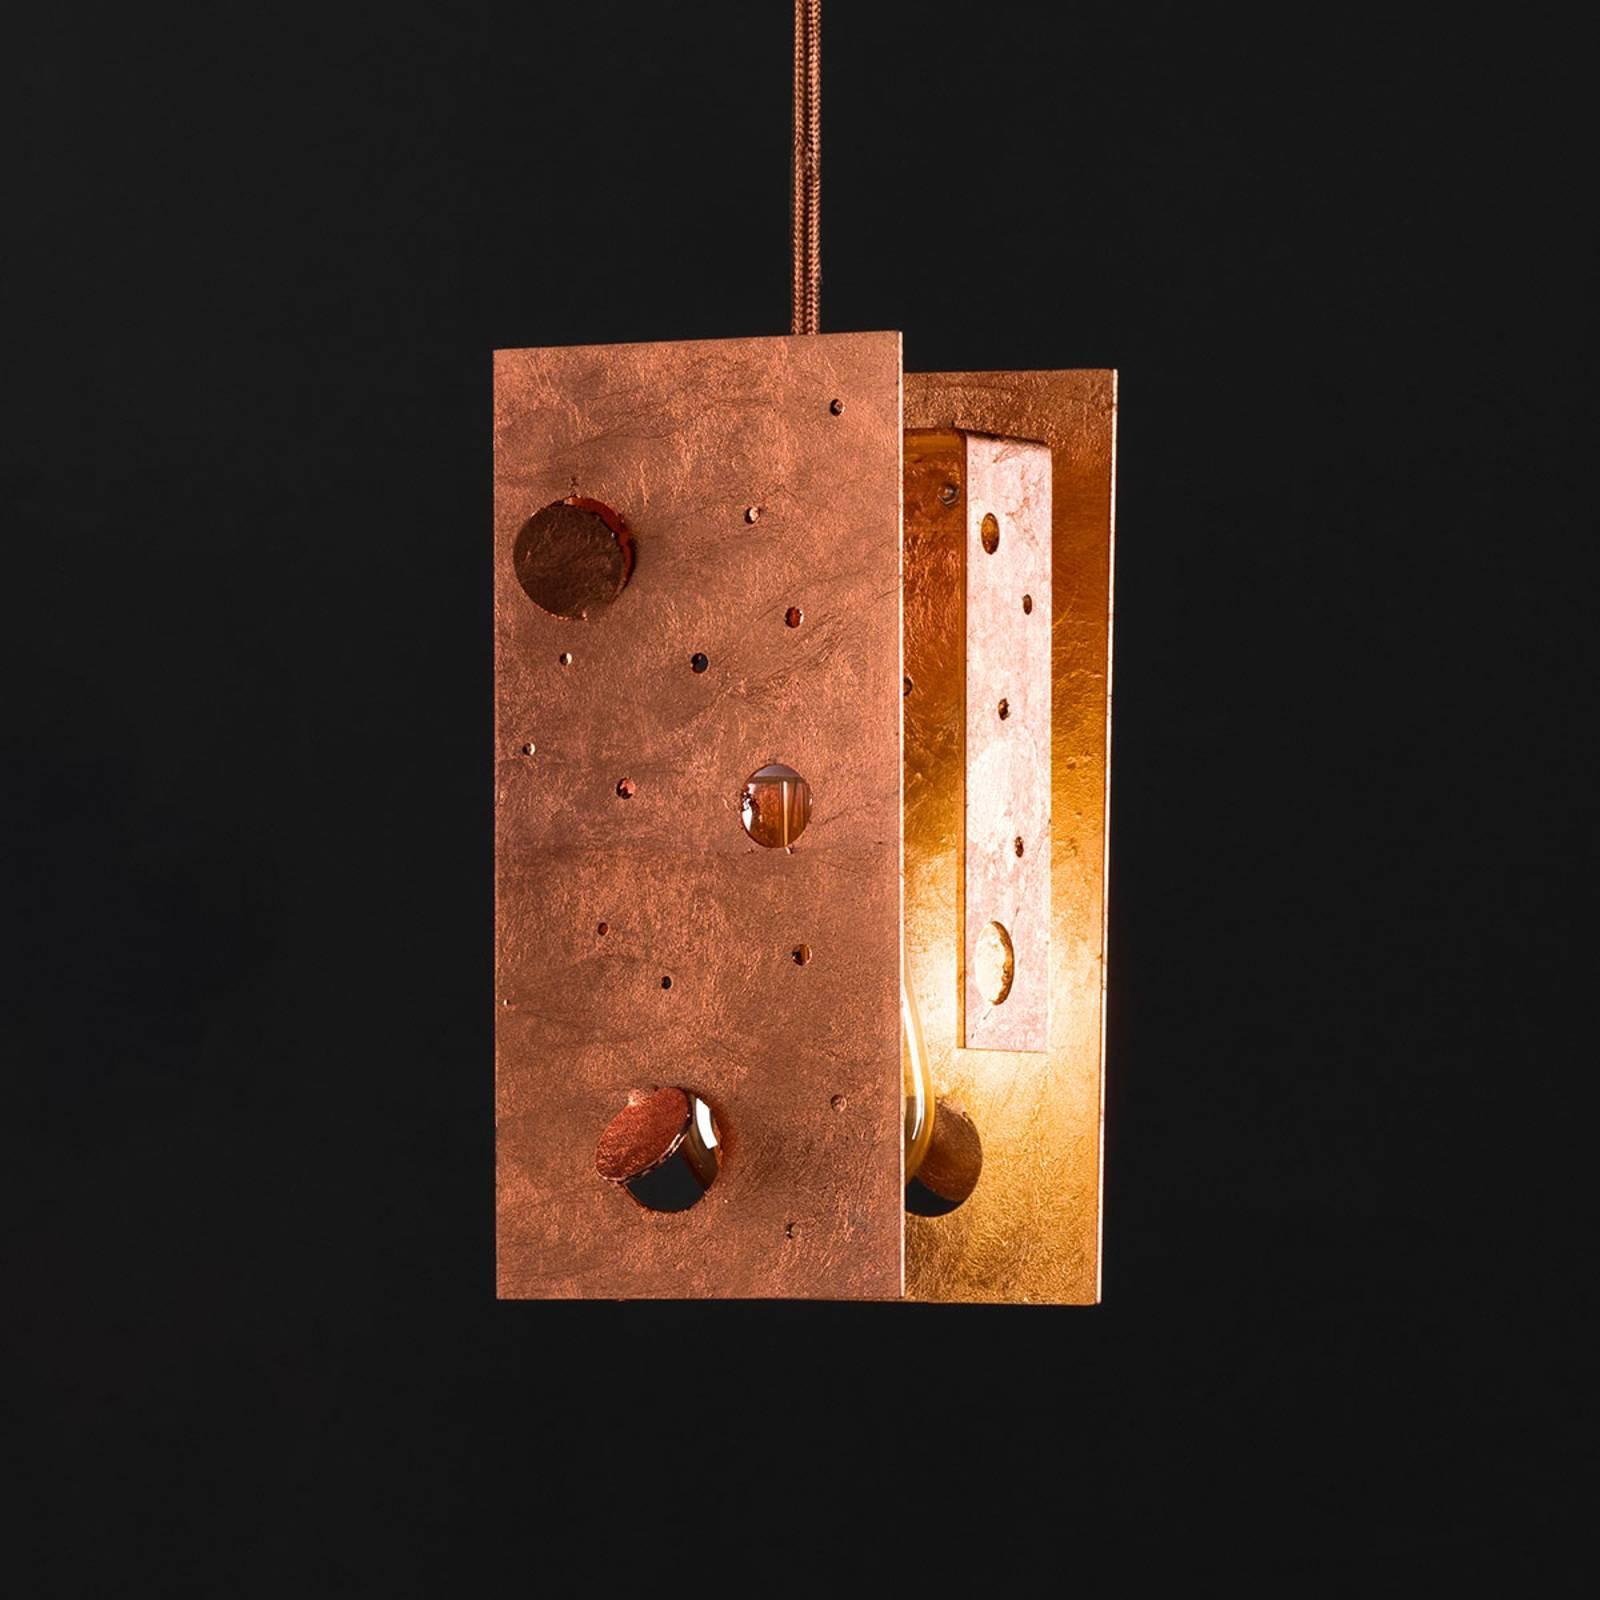 Knikerboker Buchi hengelampe 19x19x40 cm kobber